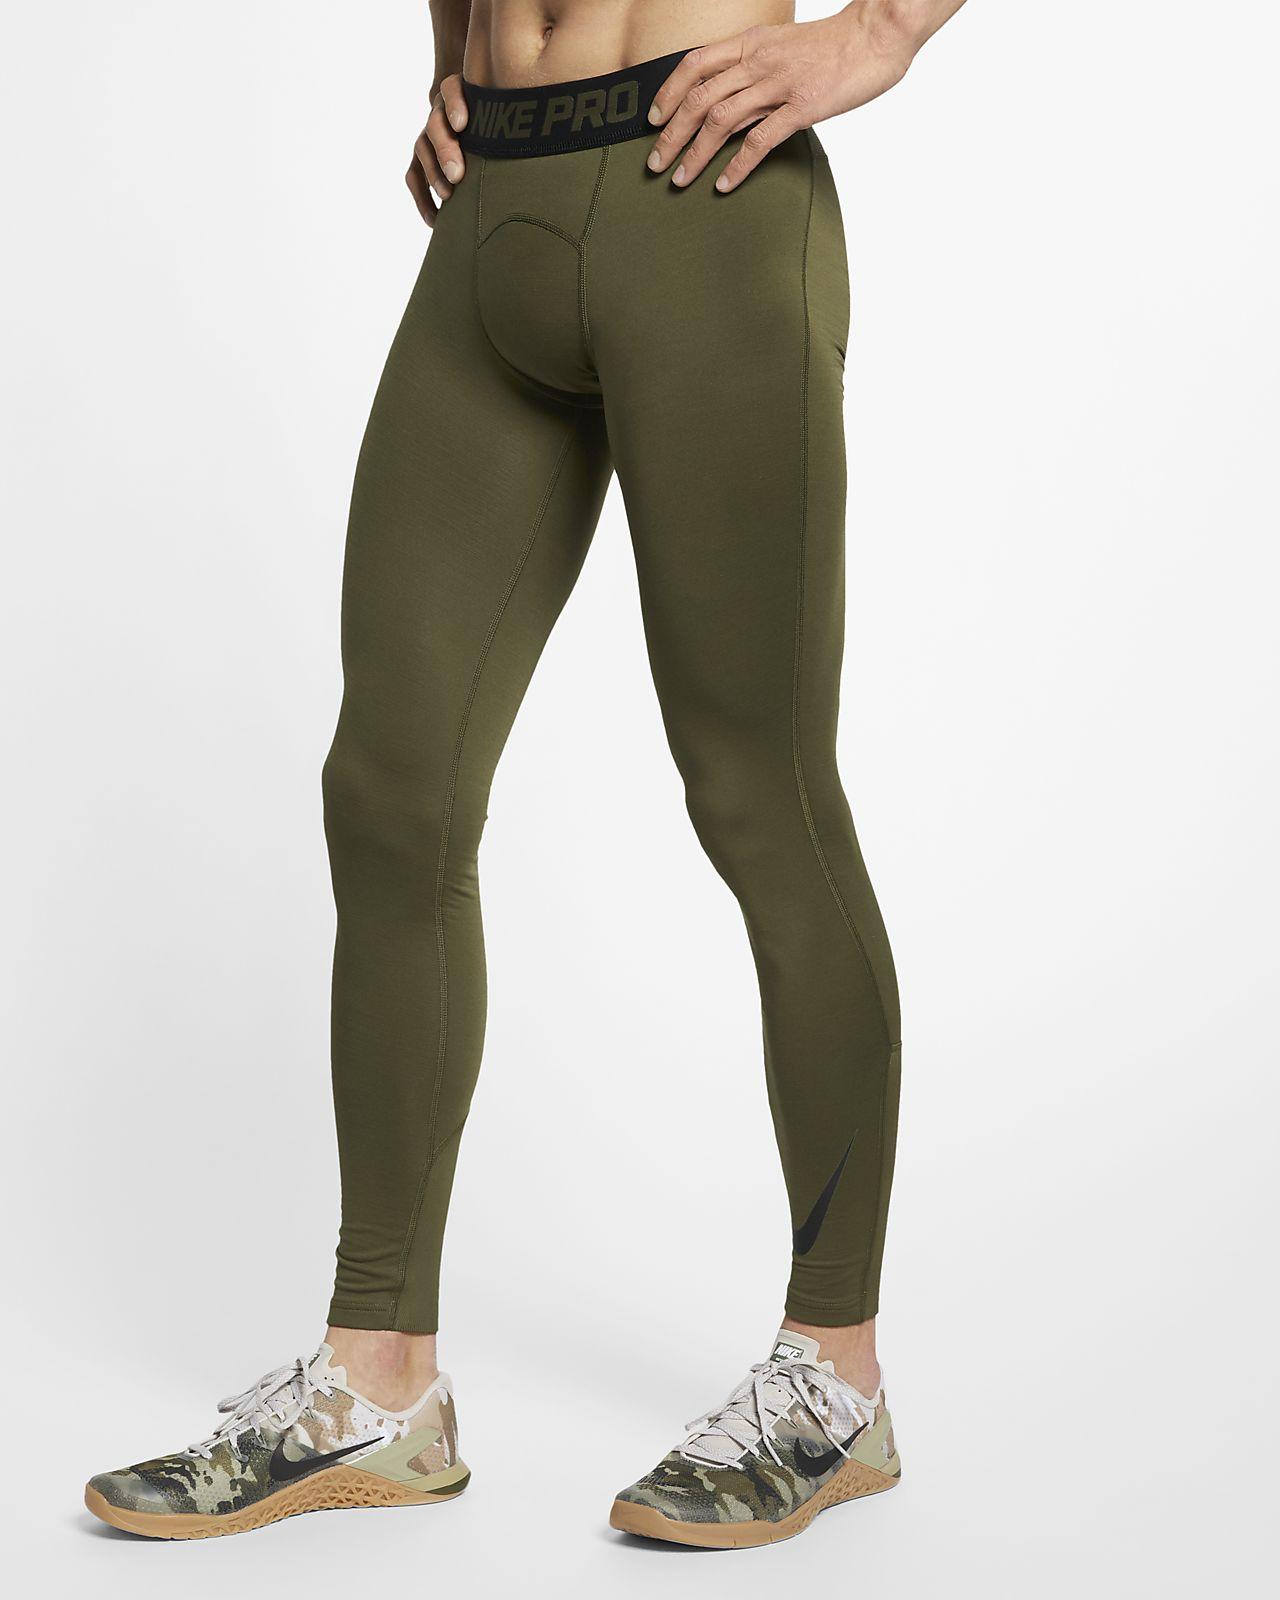 Nike Pro Dri-FIT Therma testhezálló férfinadrág